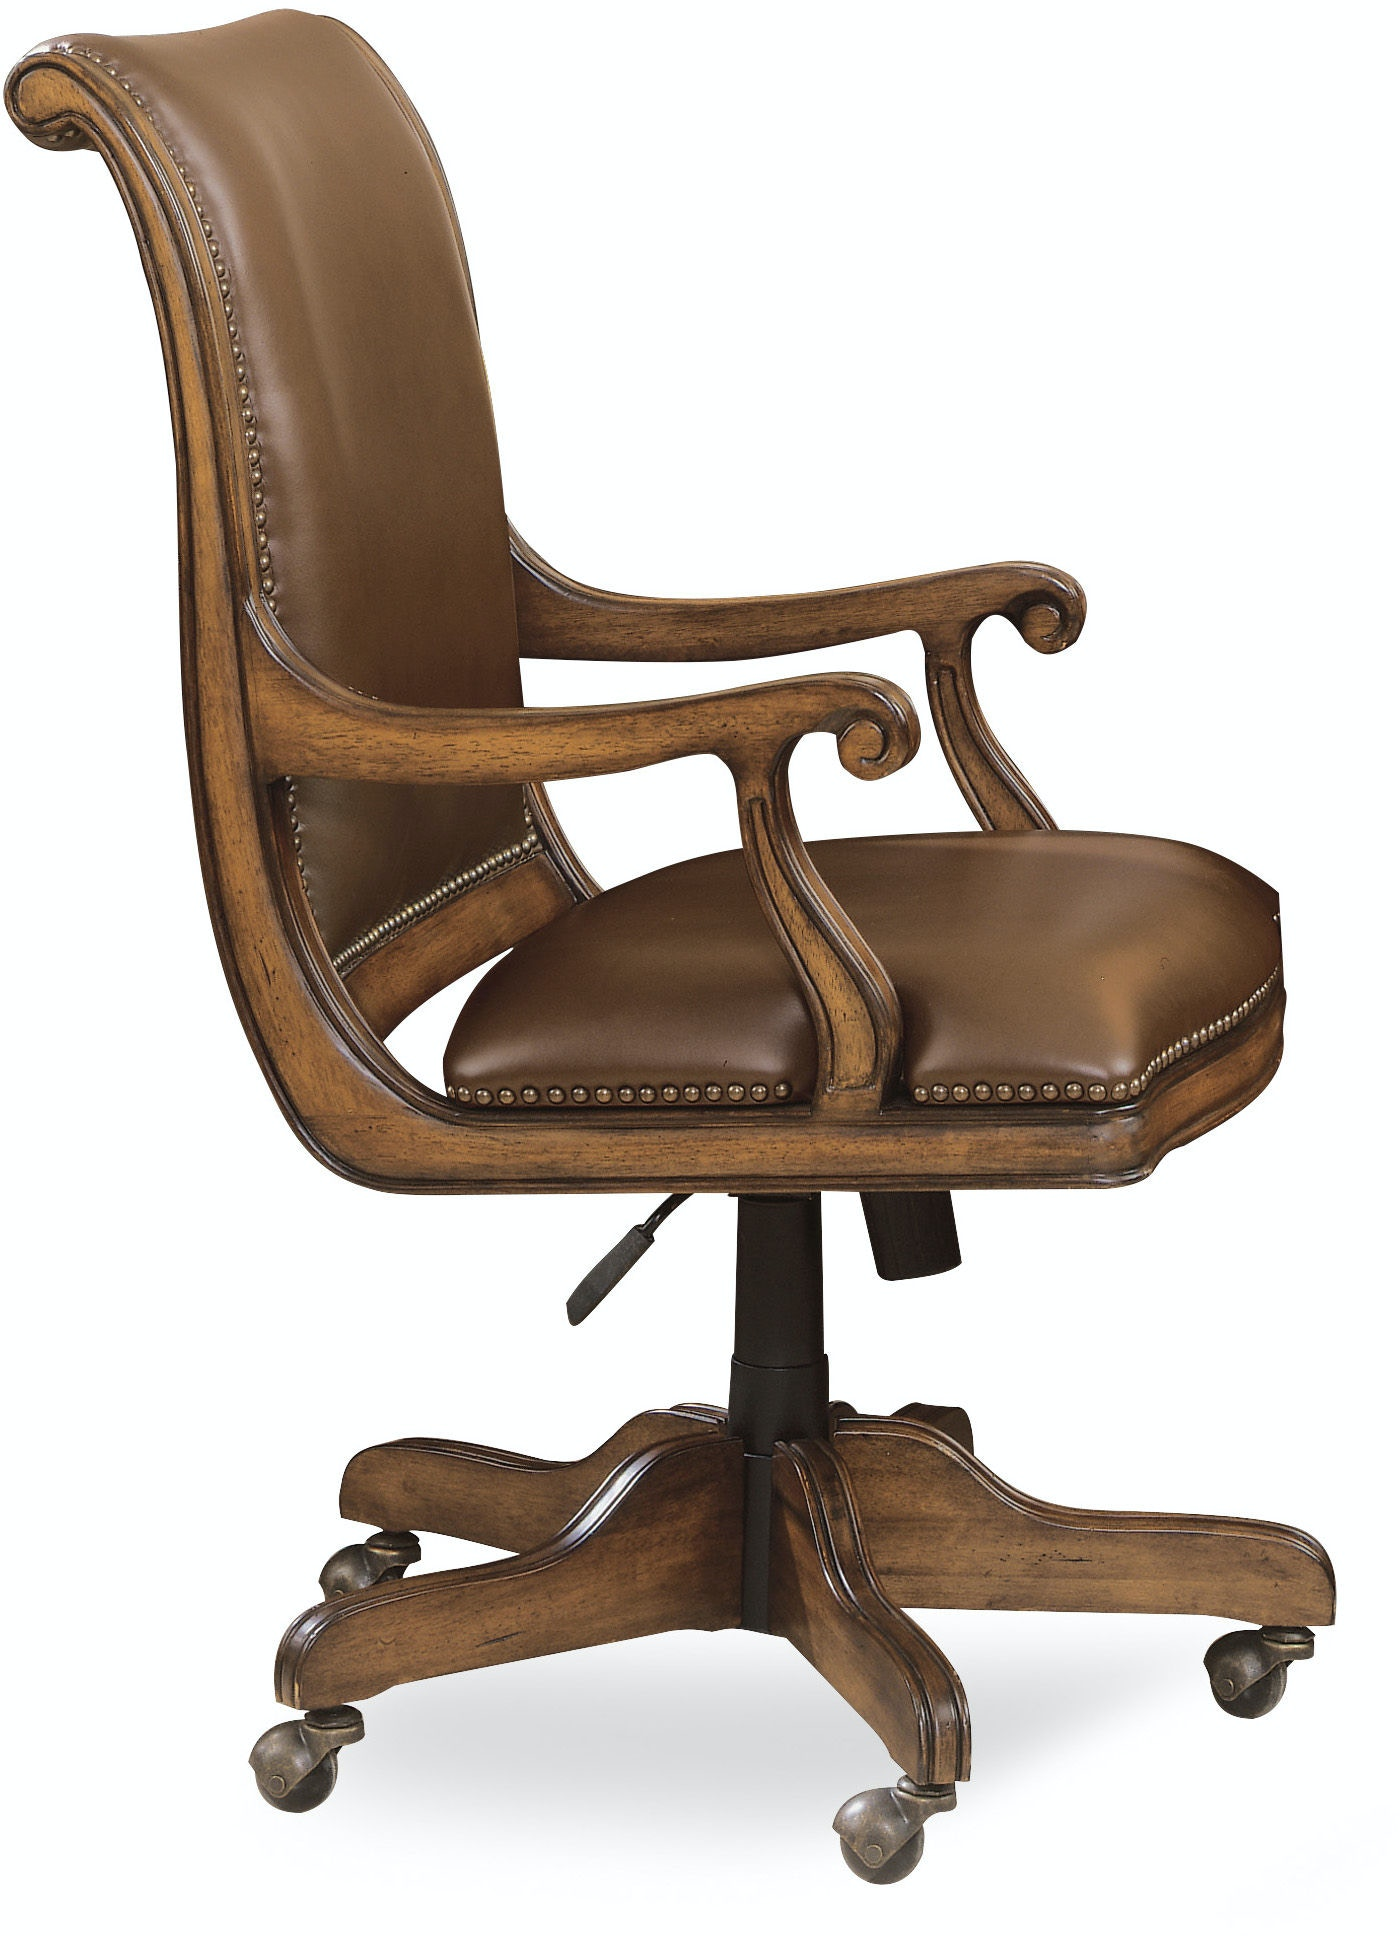 Hooker Furniture Home fice Brookhaven Desk Chair 281 30 220